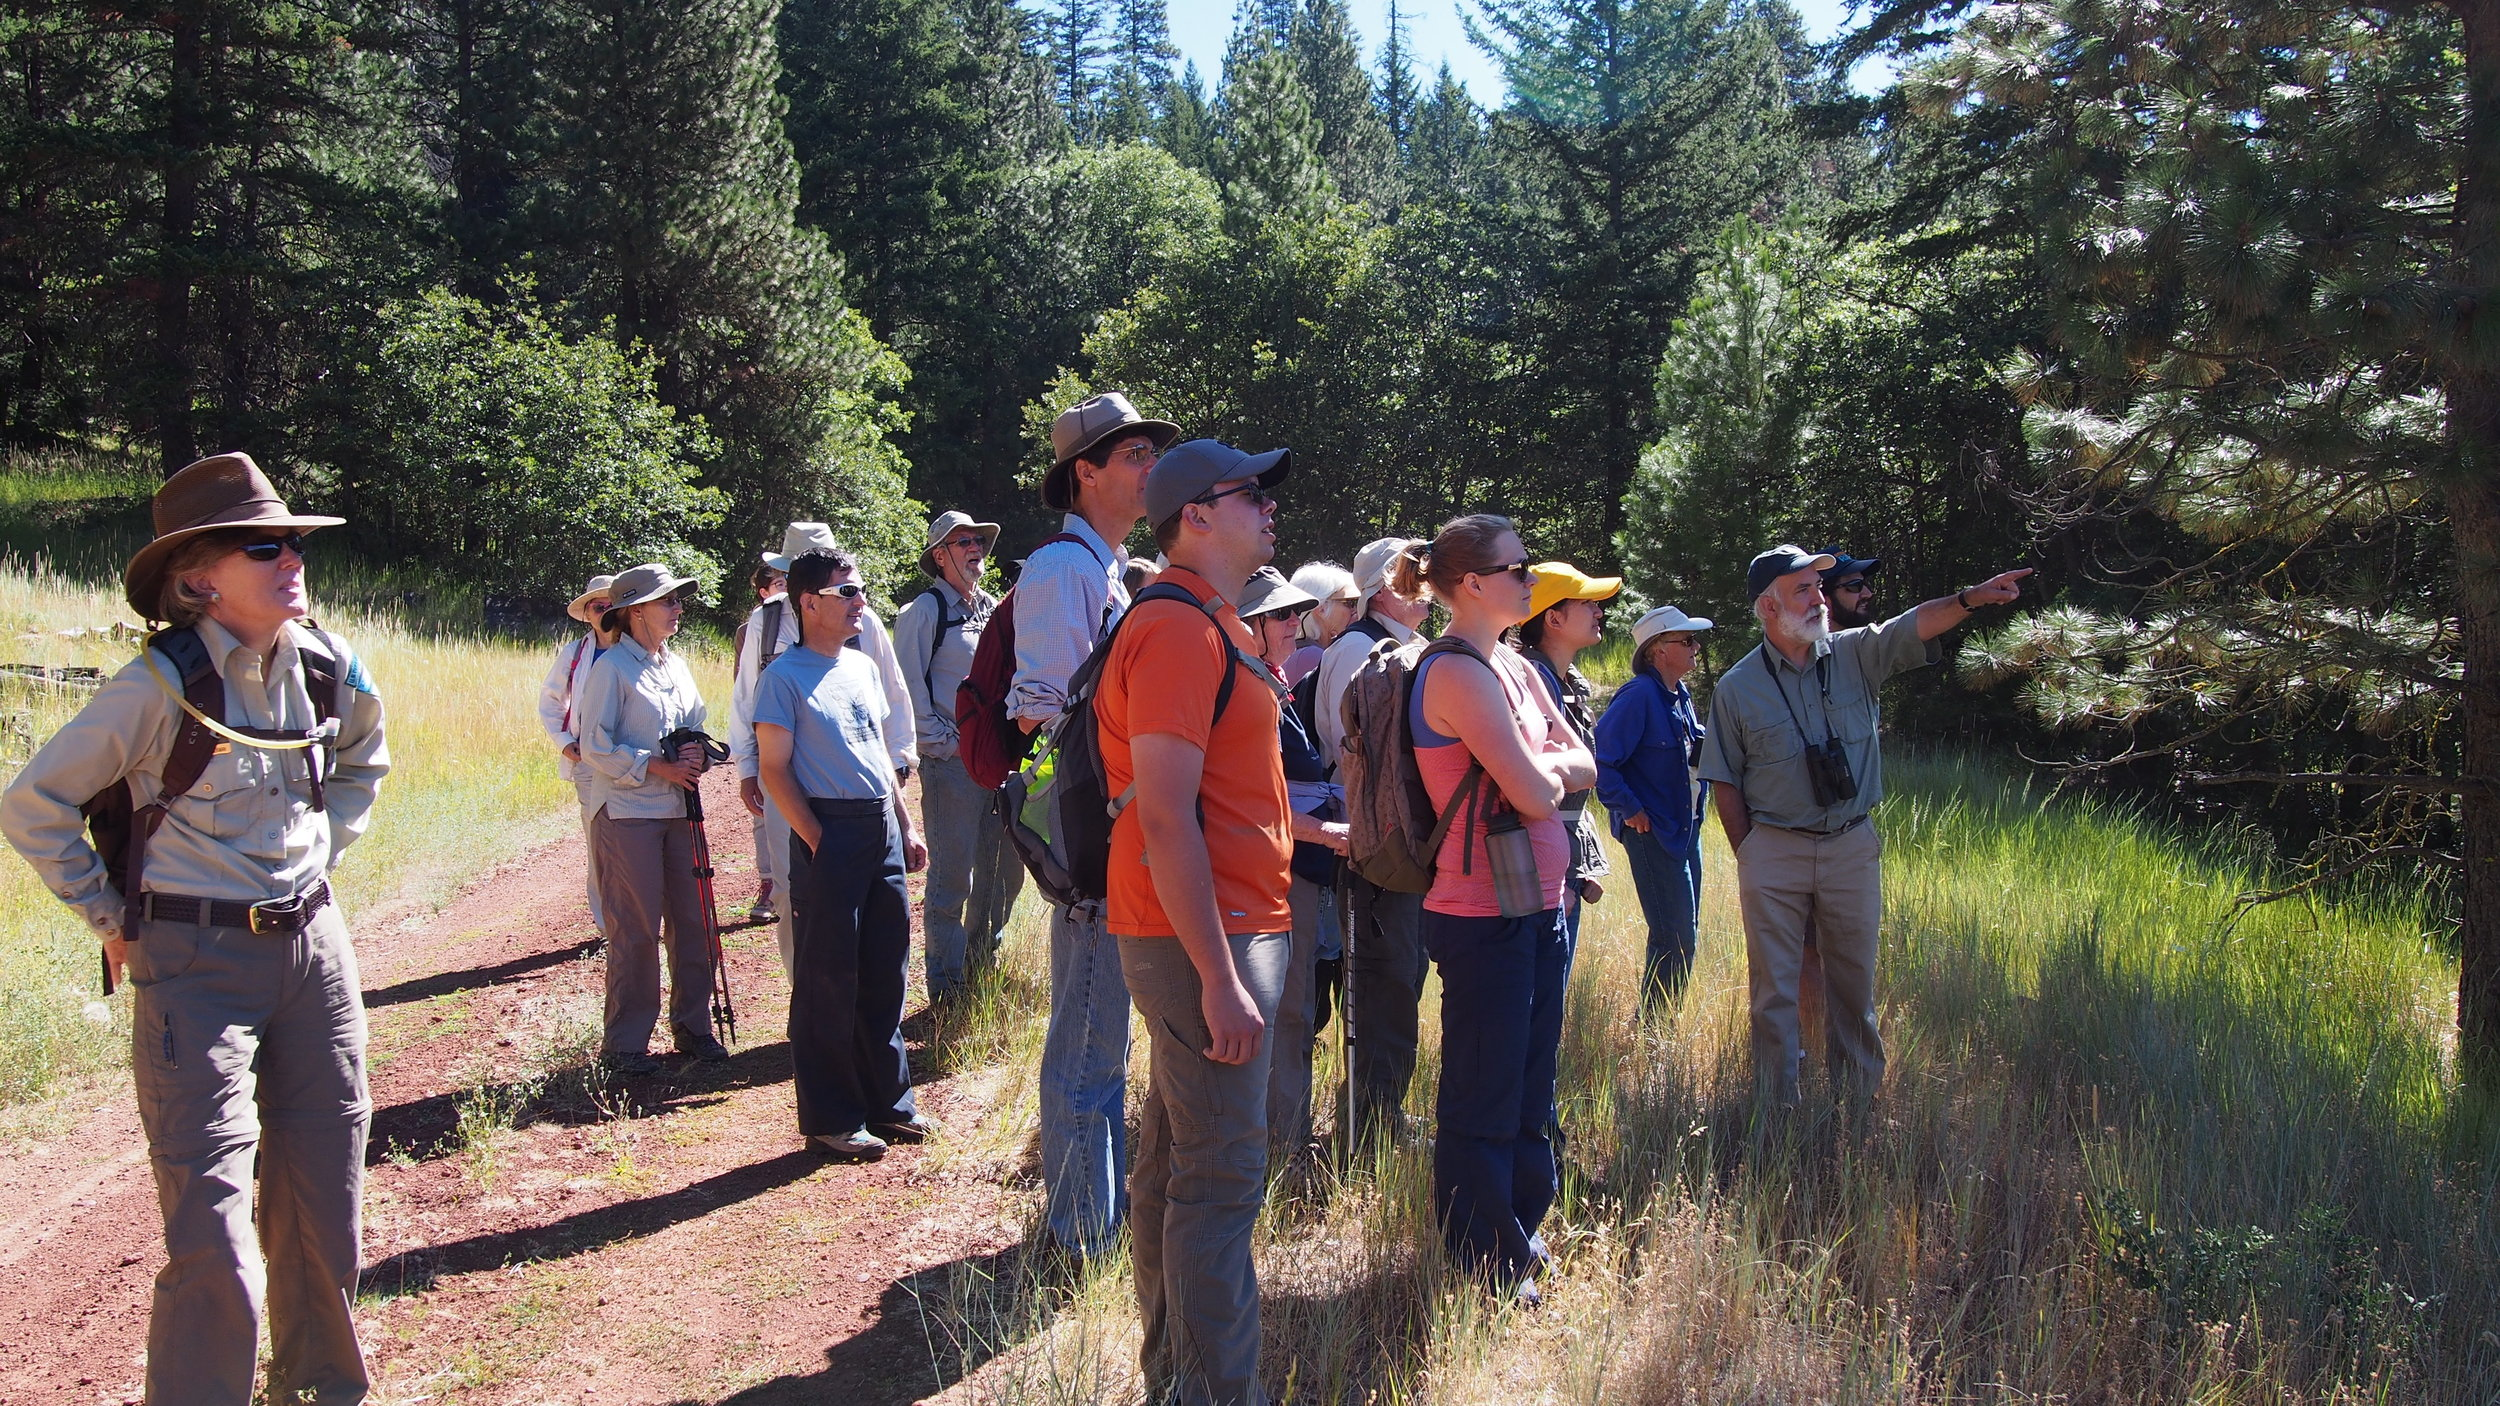 Aquatic ecologist  Michael Parker (r) shows participants Fredenburg Meadow, a unique wet meadow fed by Jenny Creek and Fredenburg Springs.